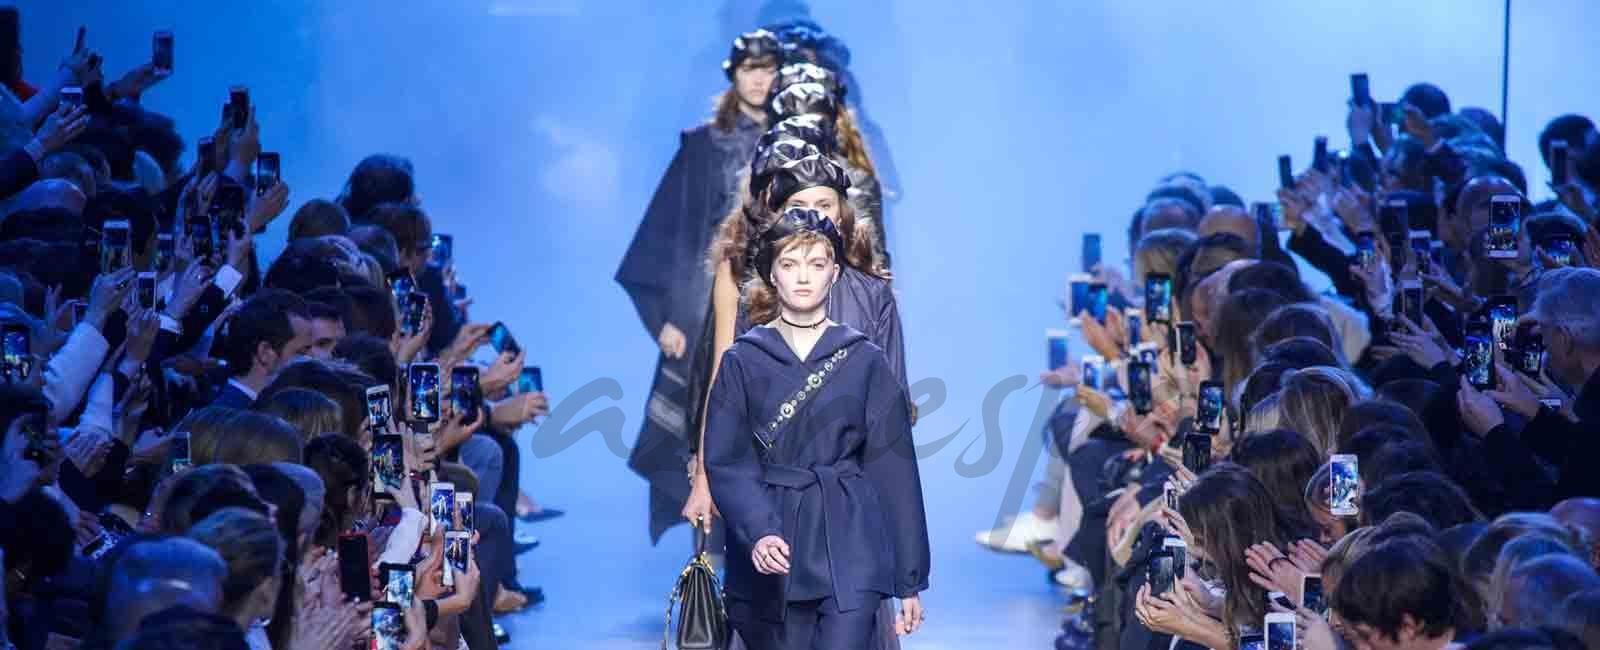 París Fashion Week: Christian Dior Otoño-Invierno 2017/18